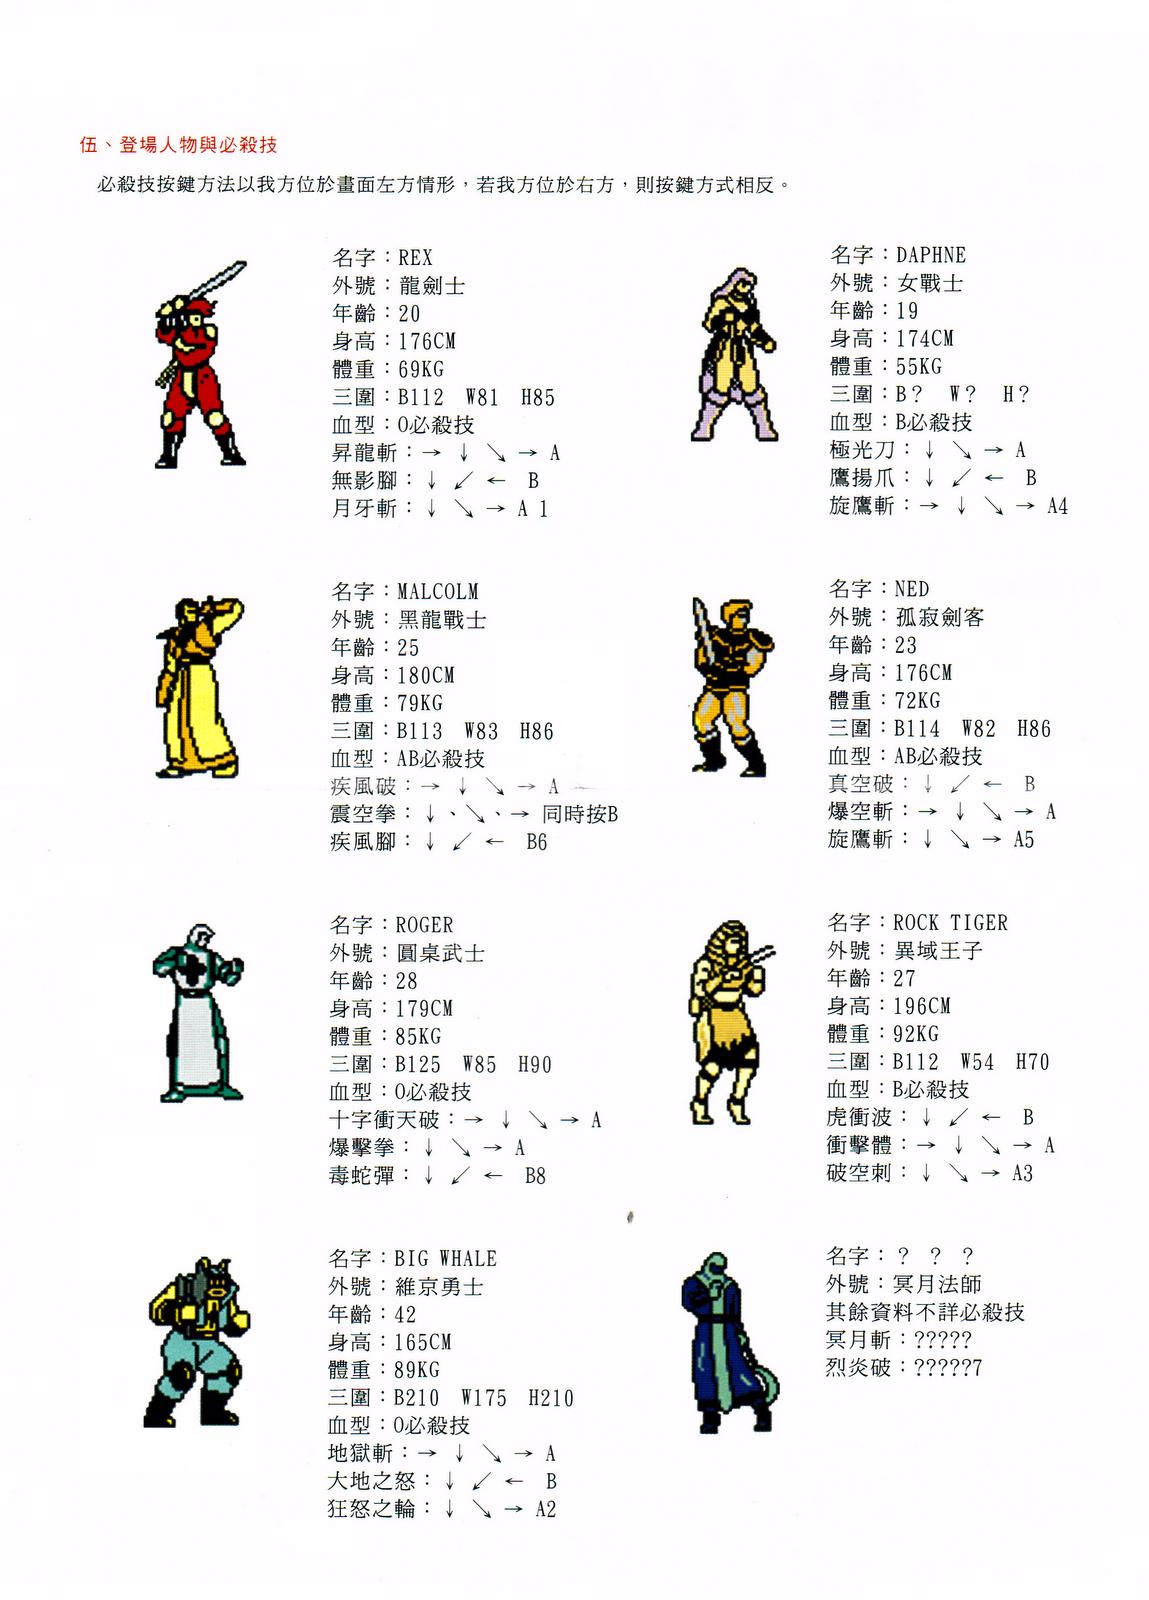 Shazam's Unlicensed Video Game Blog: Street Heroes GBC